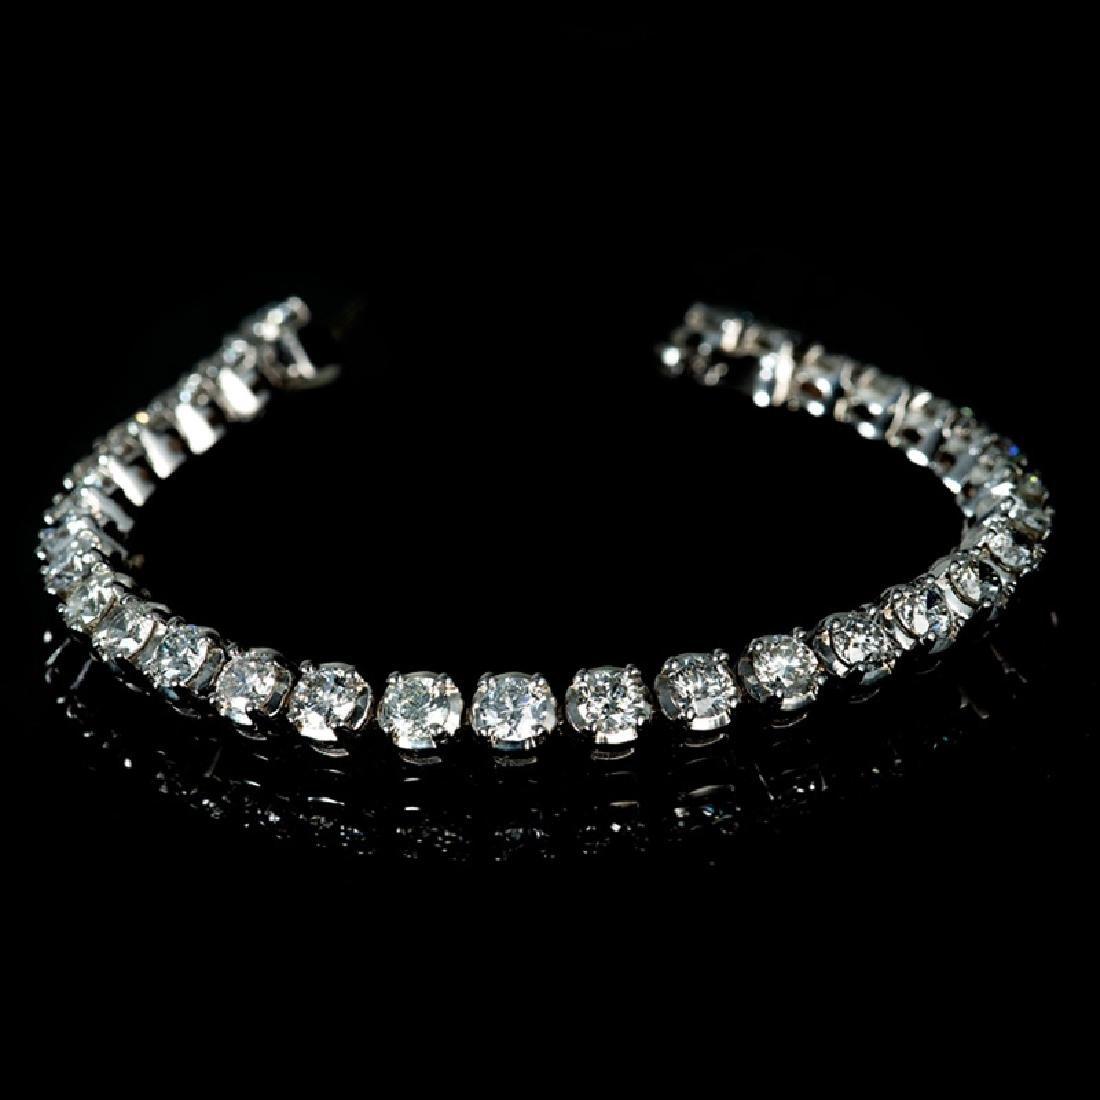 *Fine Jewelry 14 kt. White Gold, Custom Made, 10.00CT